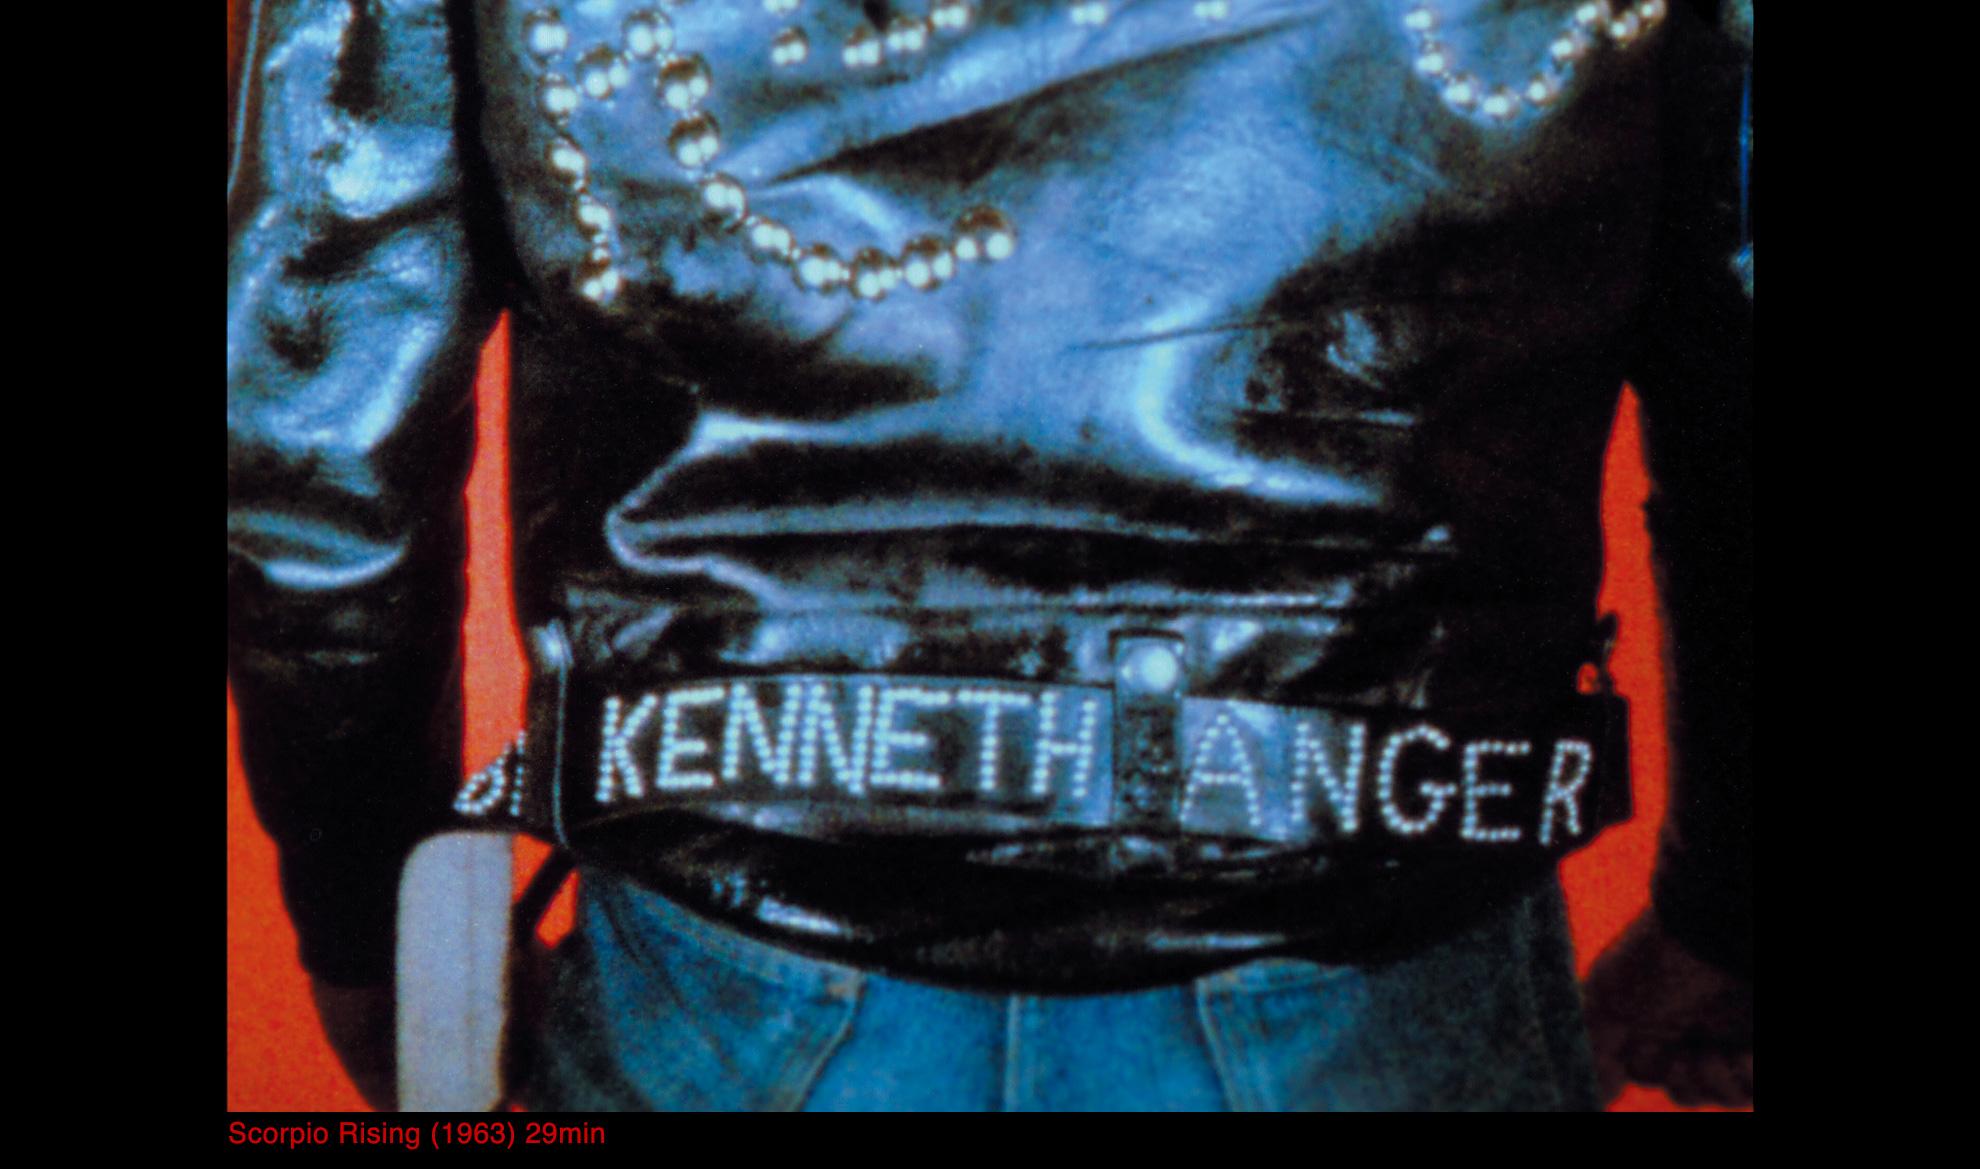 Sister x Kenneth Anger